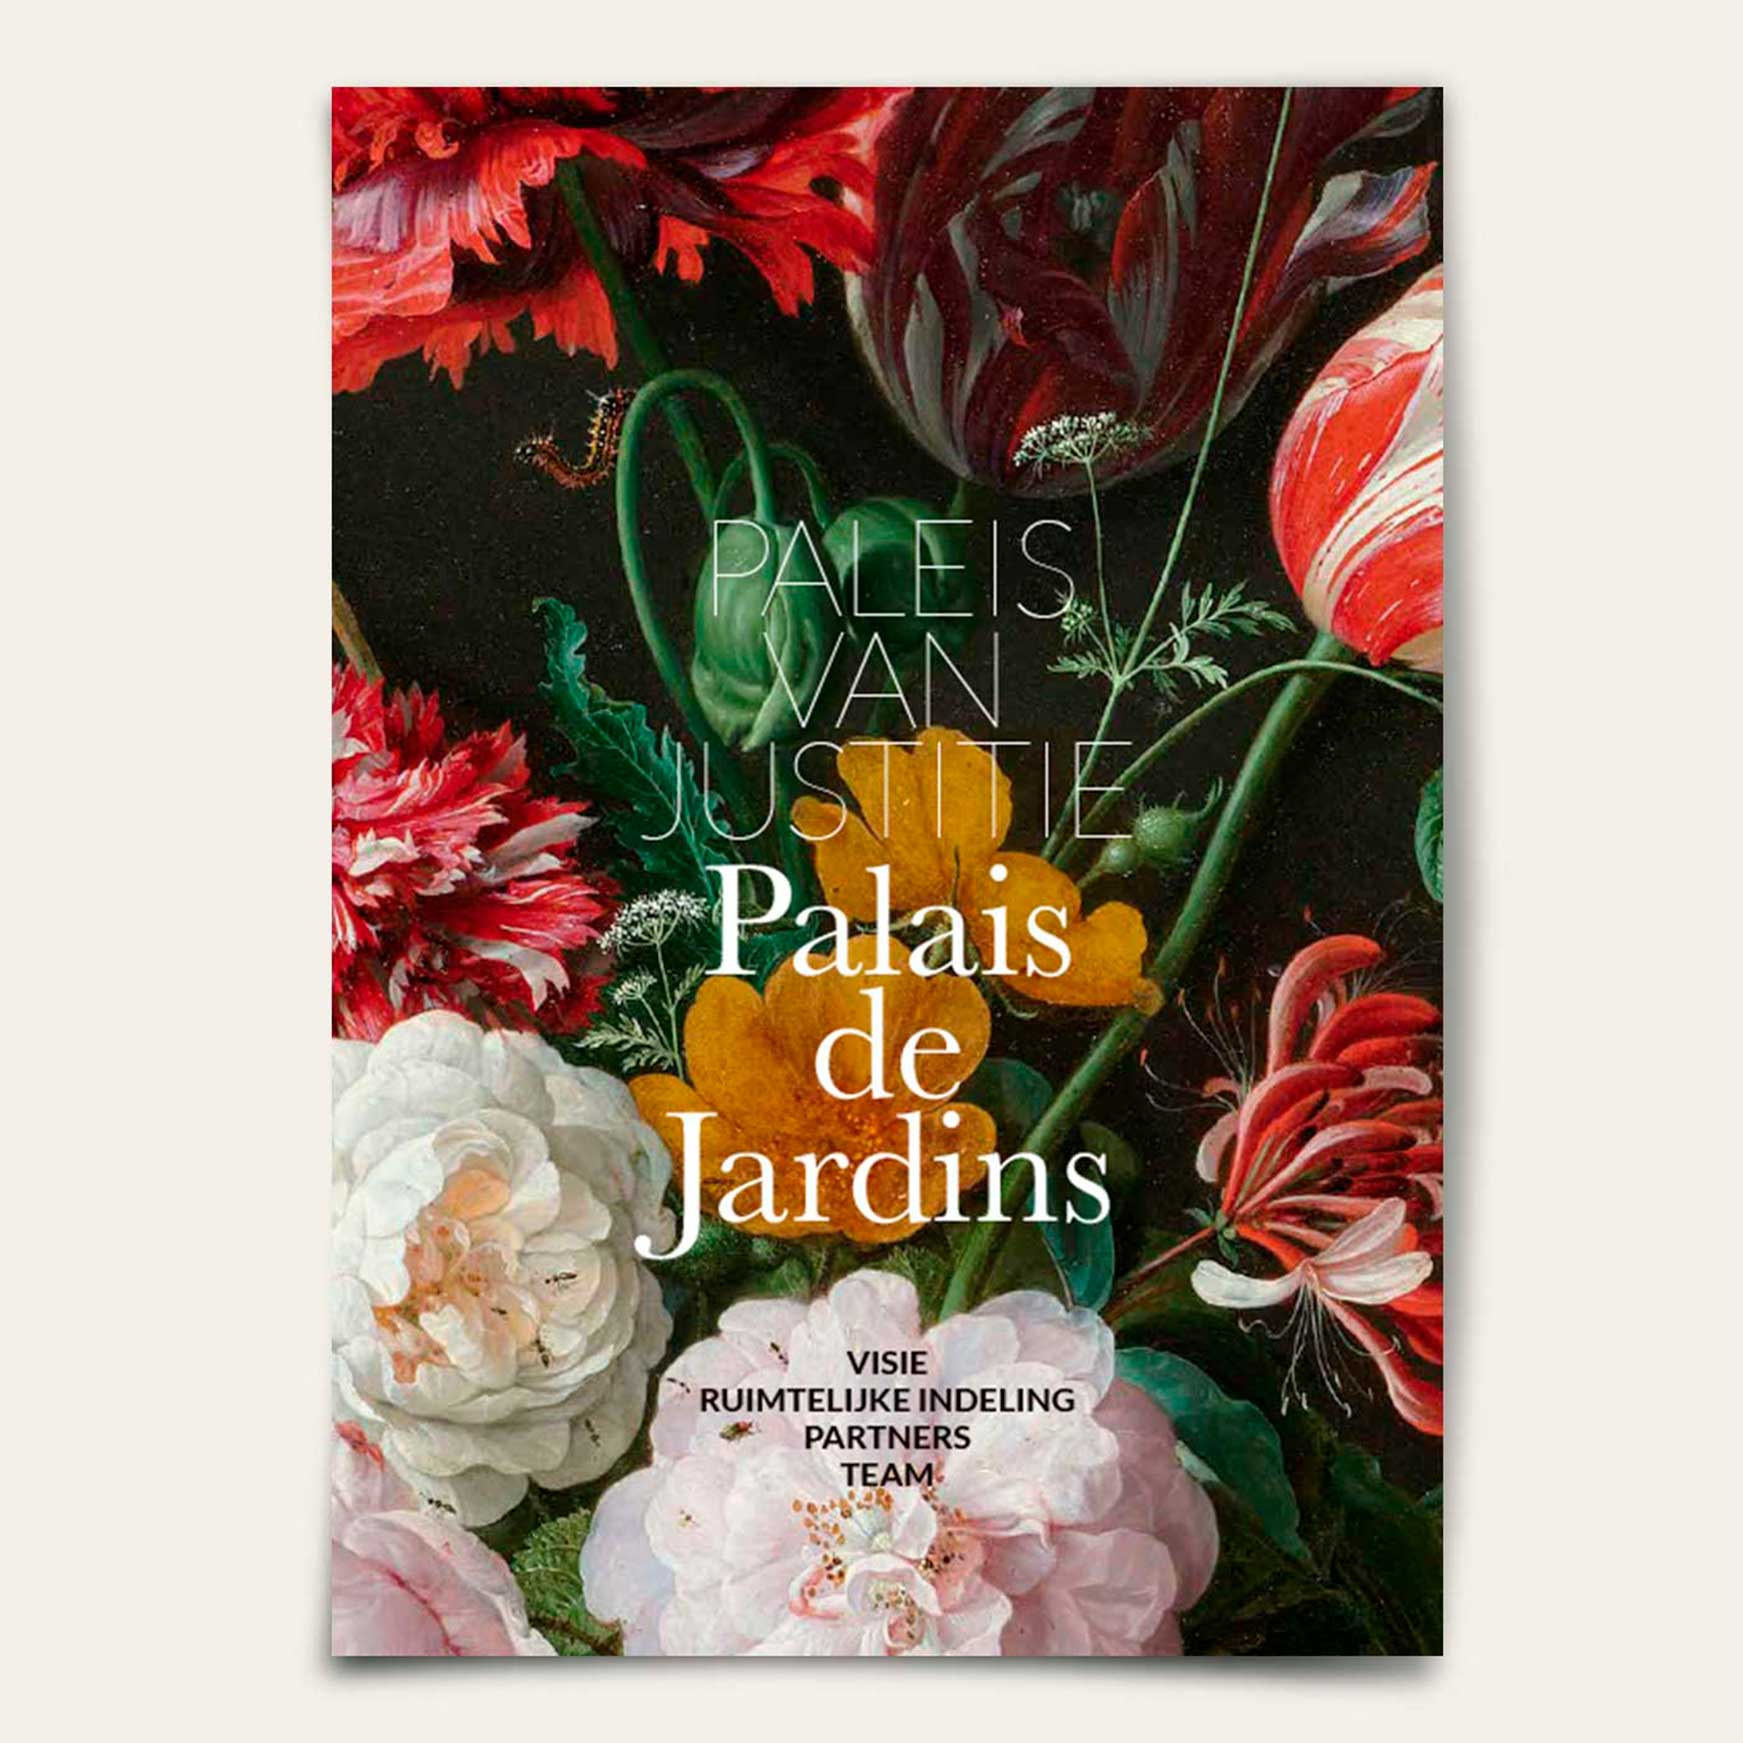 Kazeze-graphic-design-amsterdam-ehpc-office-winhov-prijsvraag-palais-de-jardin-0-index.jpg